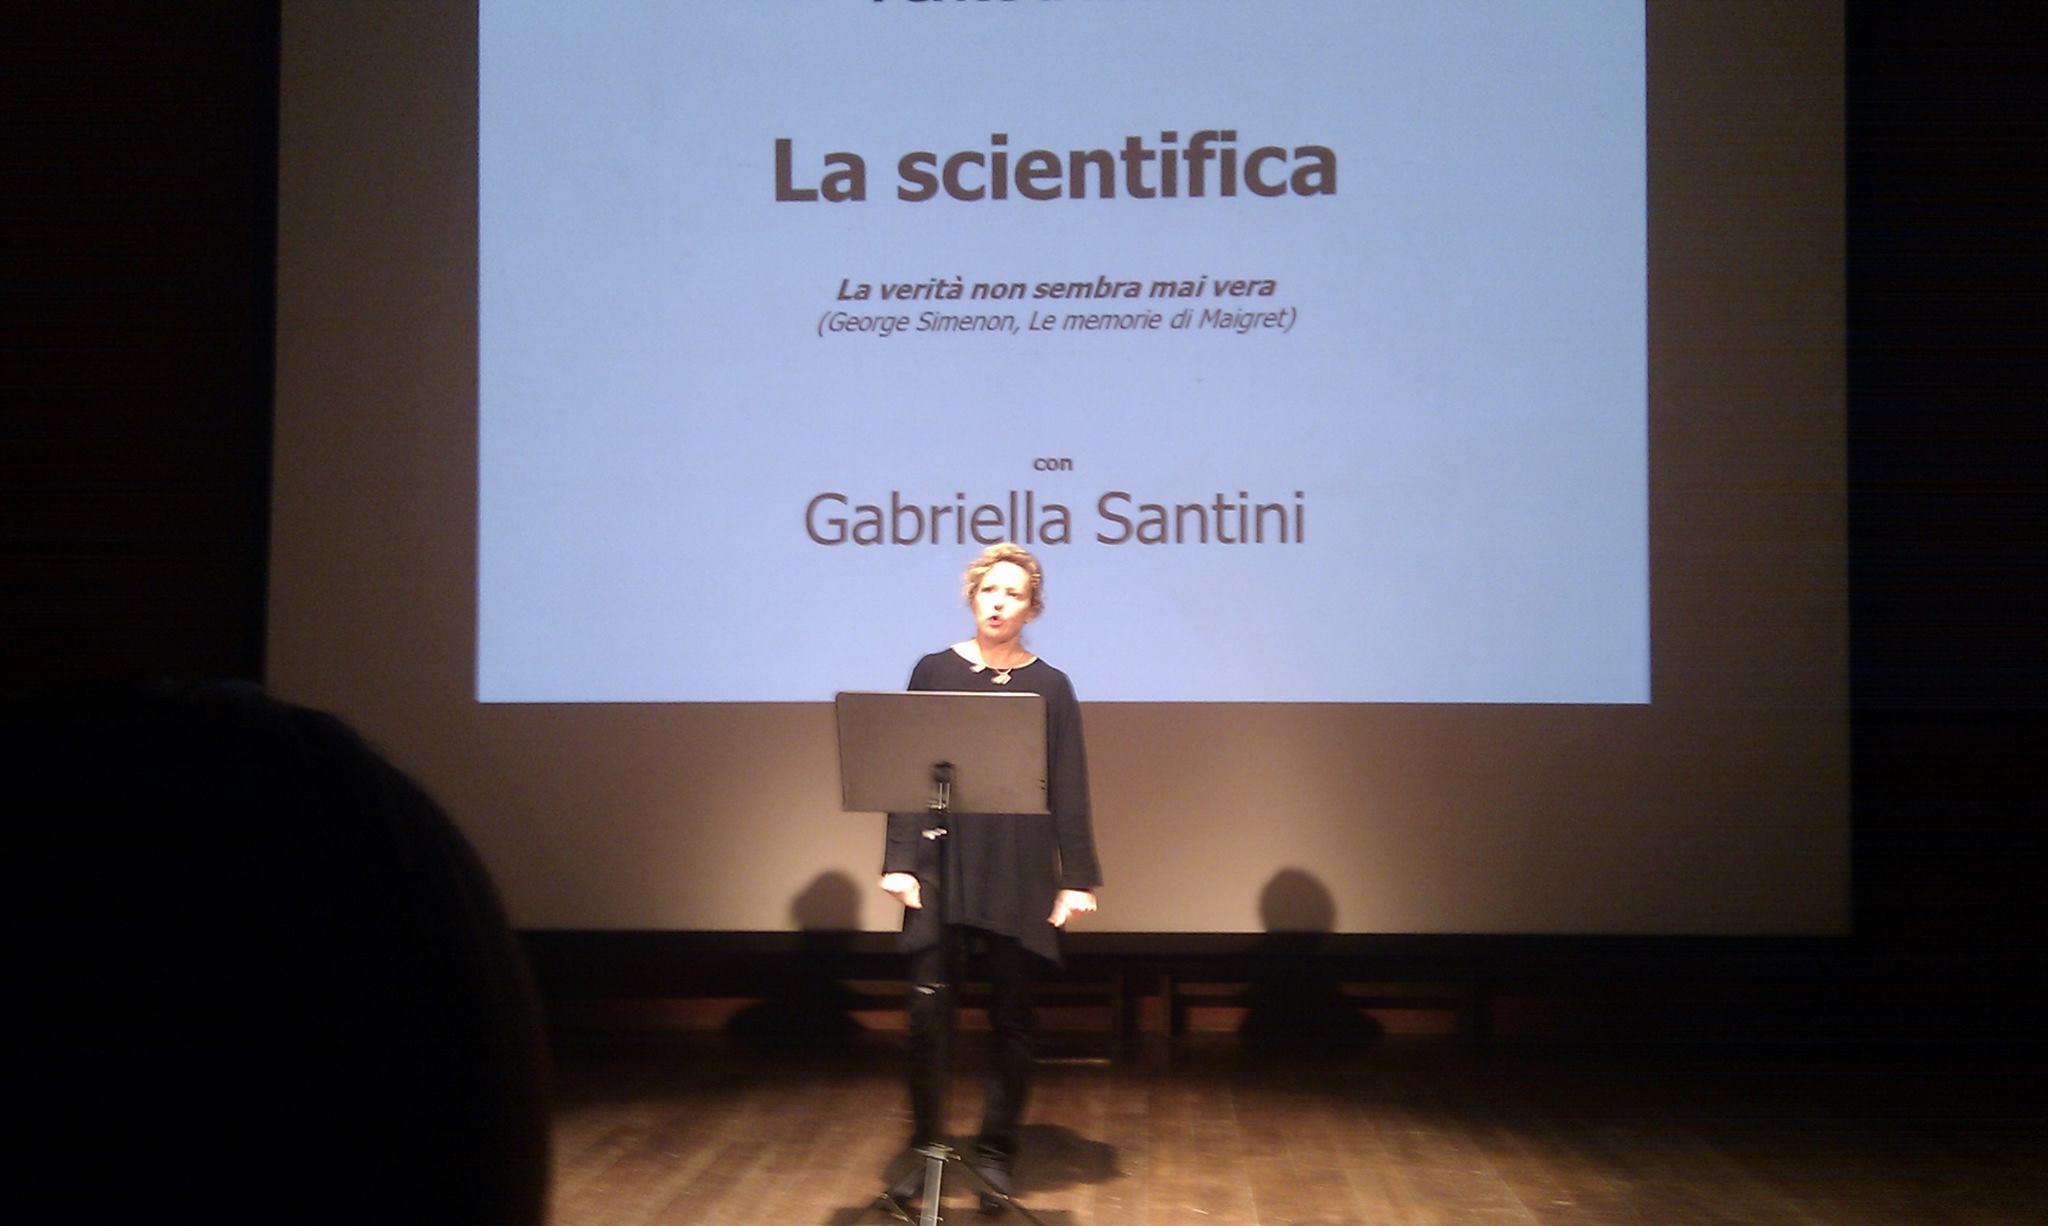 8_LaScientifica_GabriellaSantini